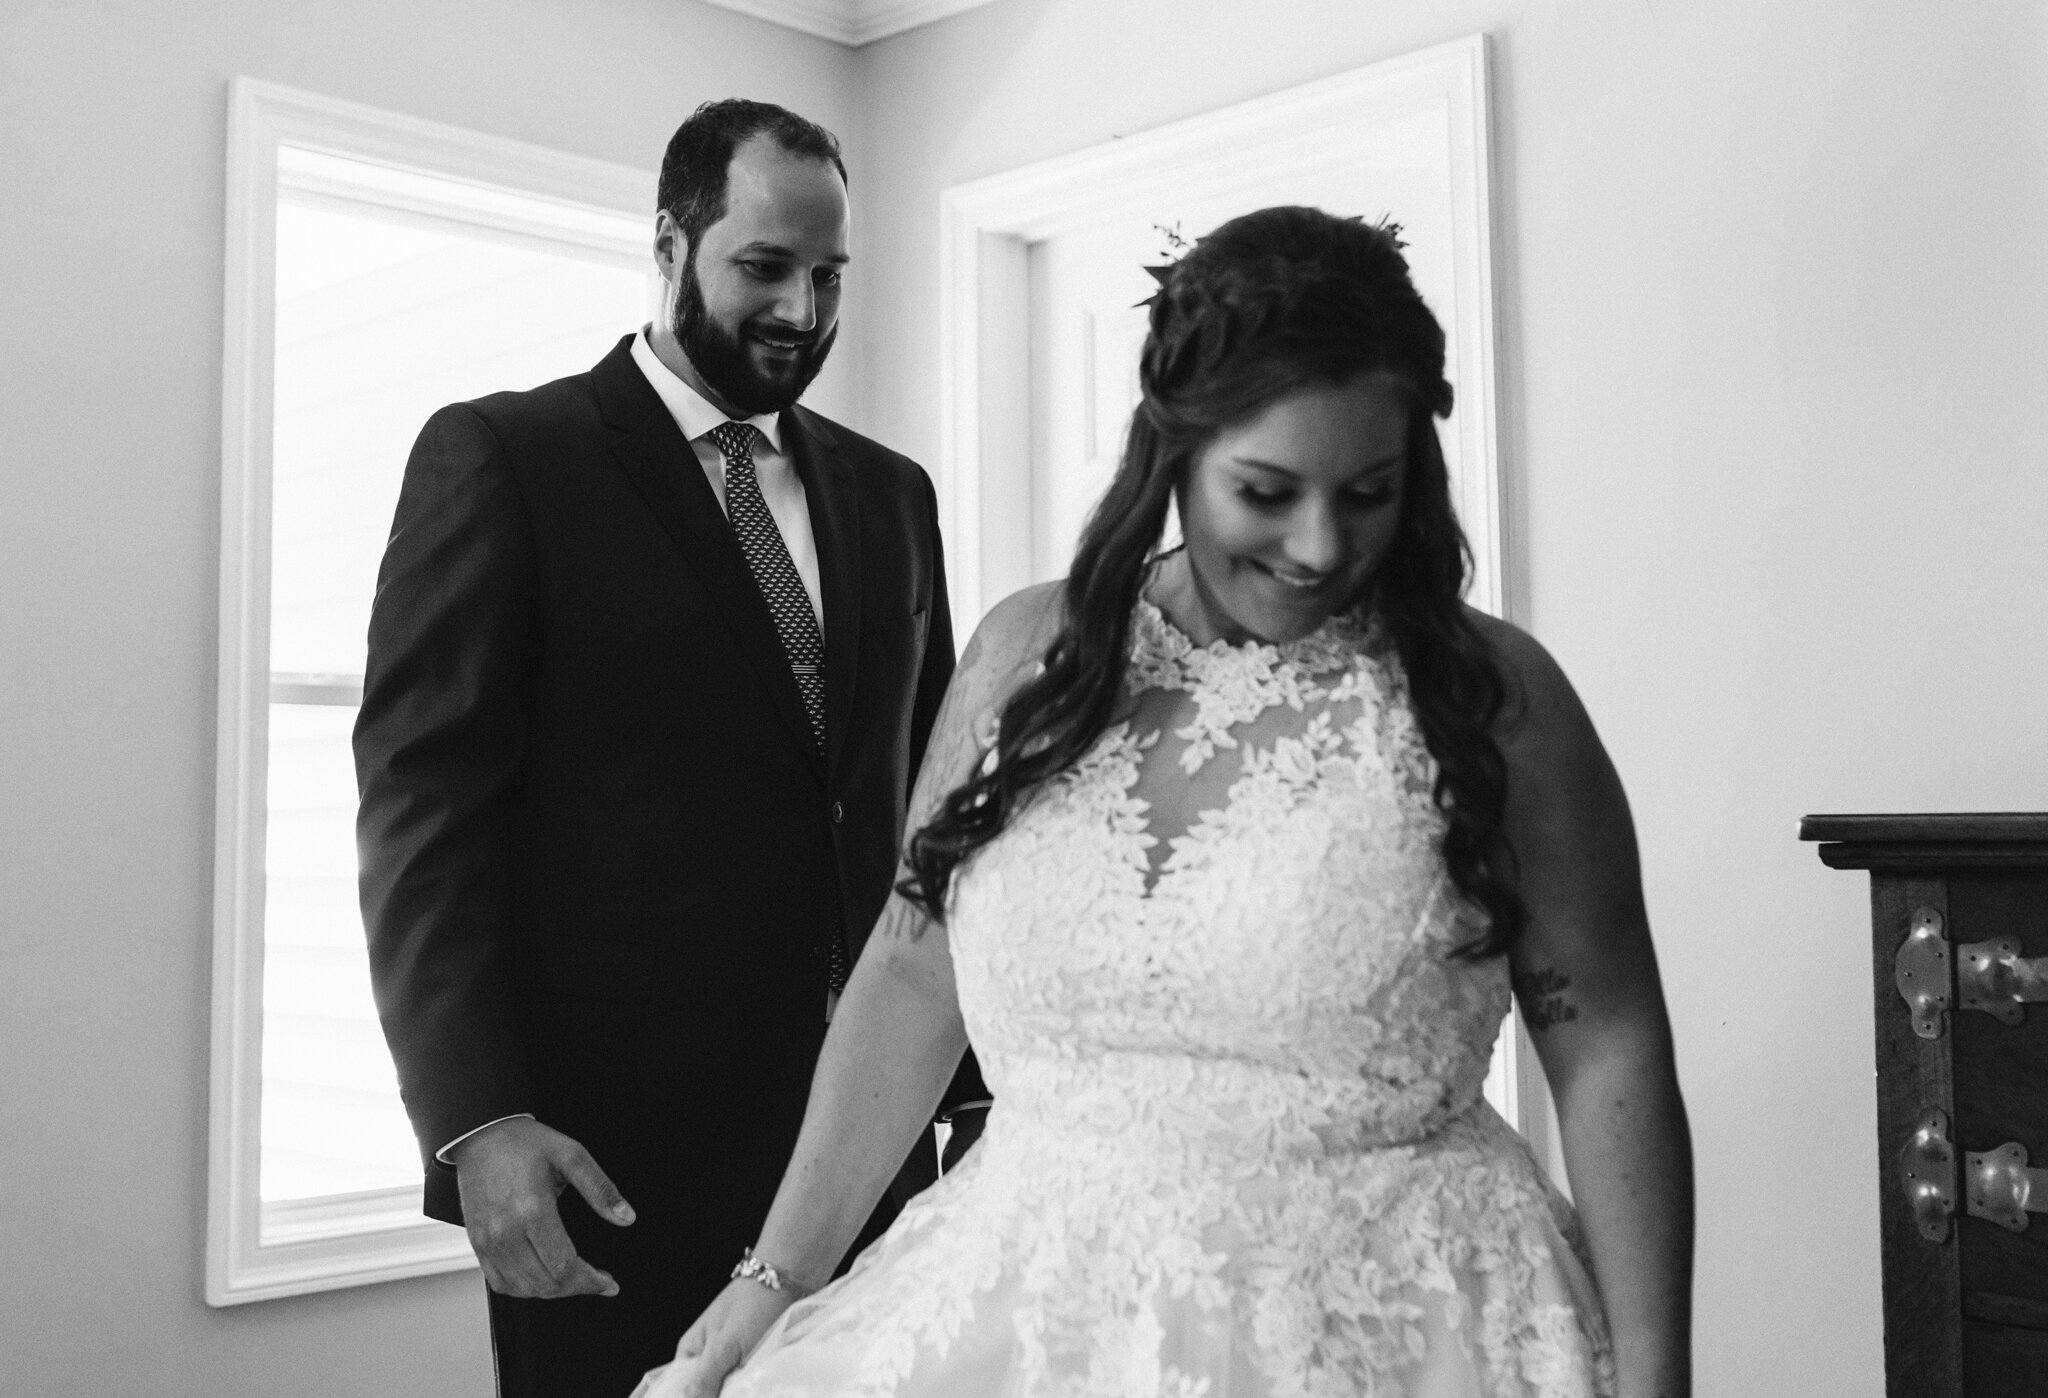 angela_jason_norfolk_wedding-49.jpg